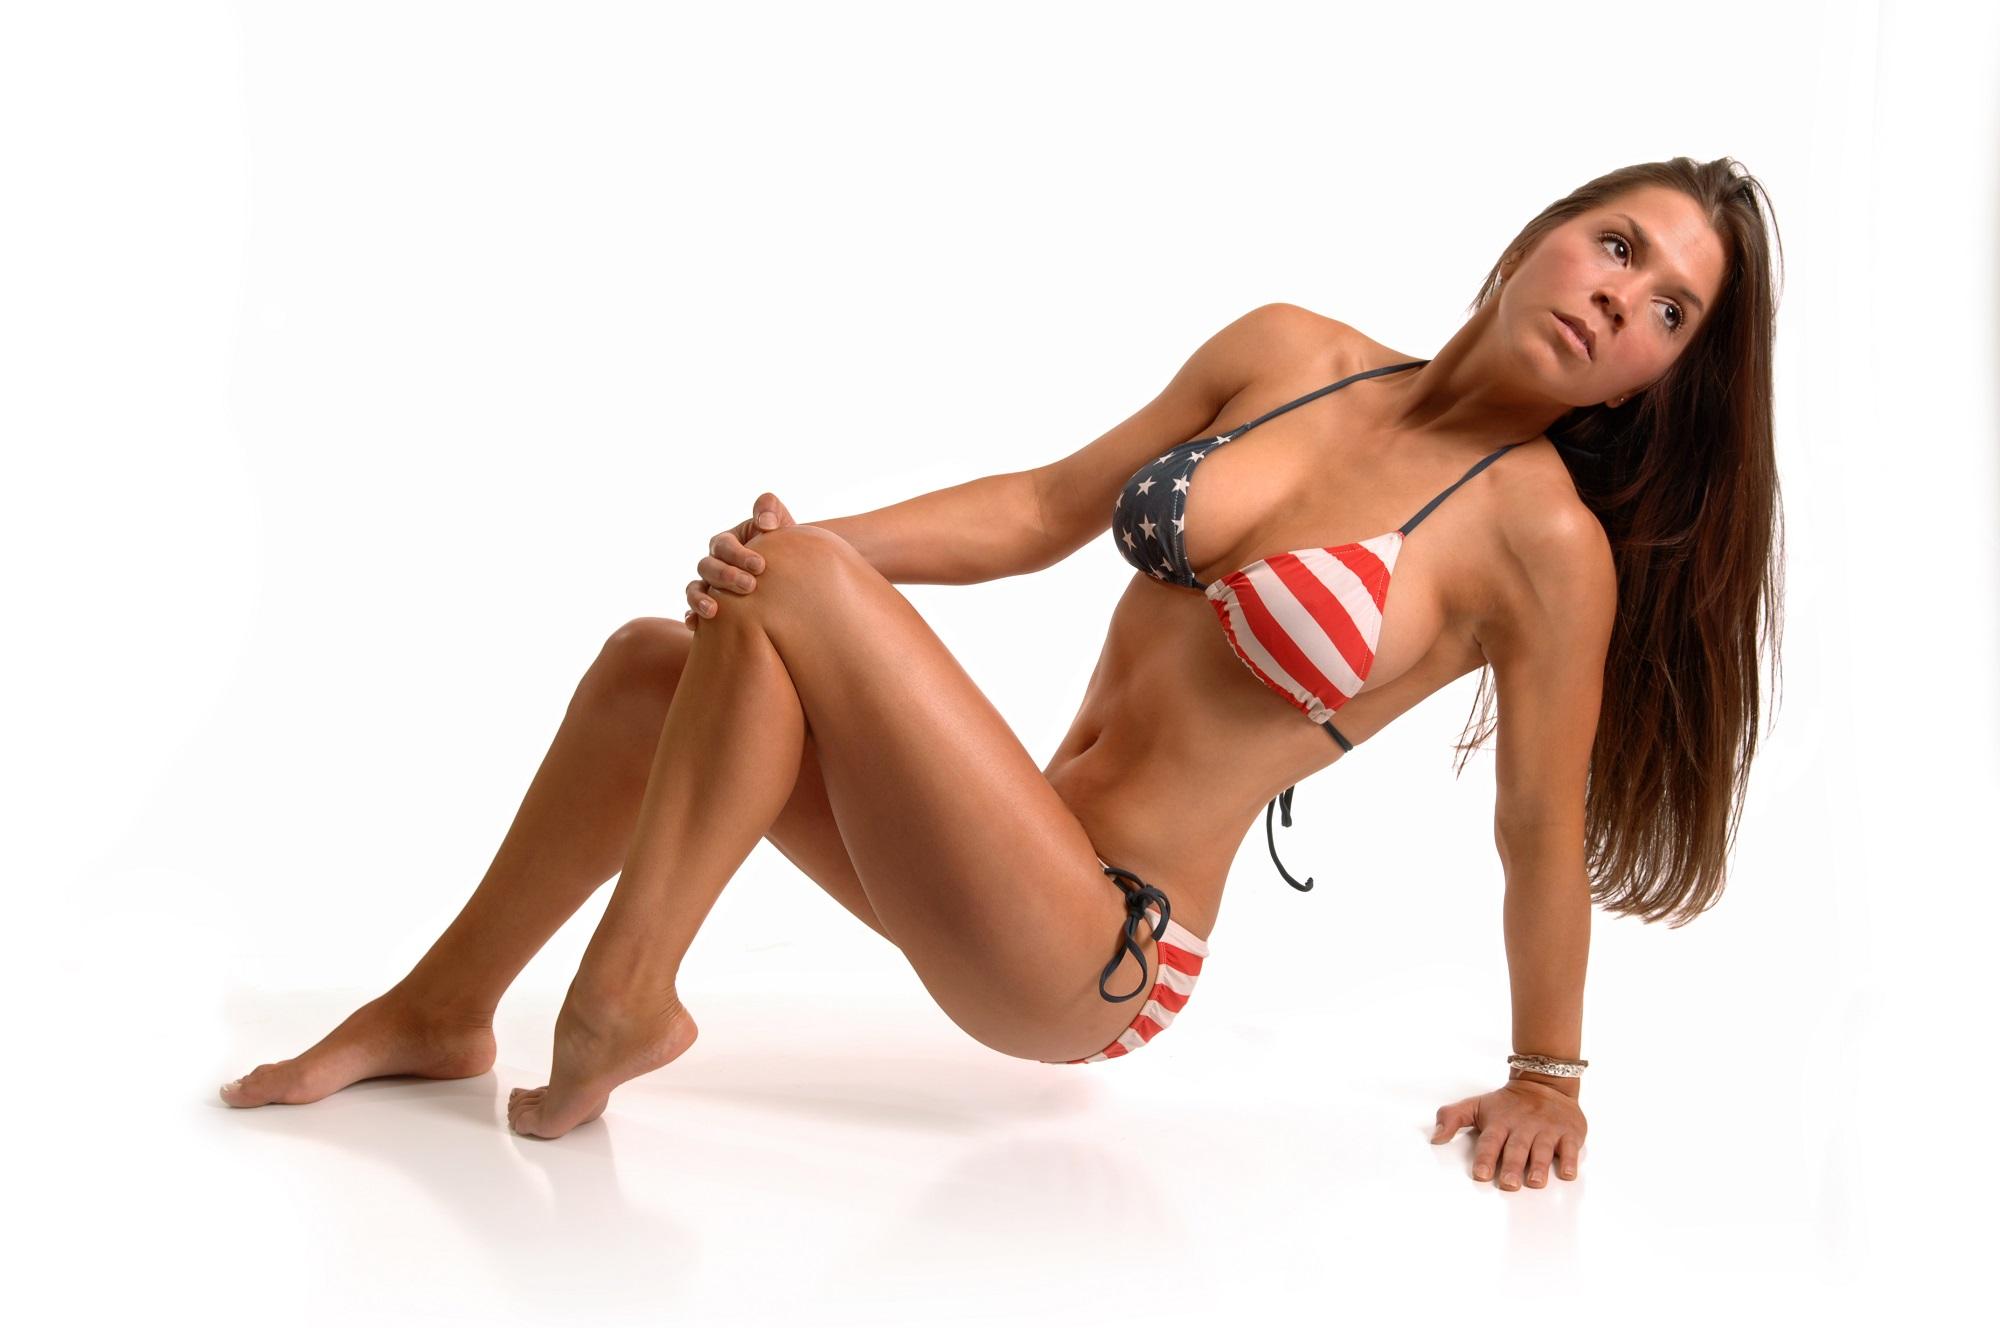 American flag bikini 8 Shutterstock A K Photo